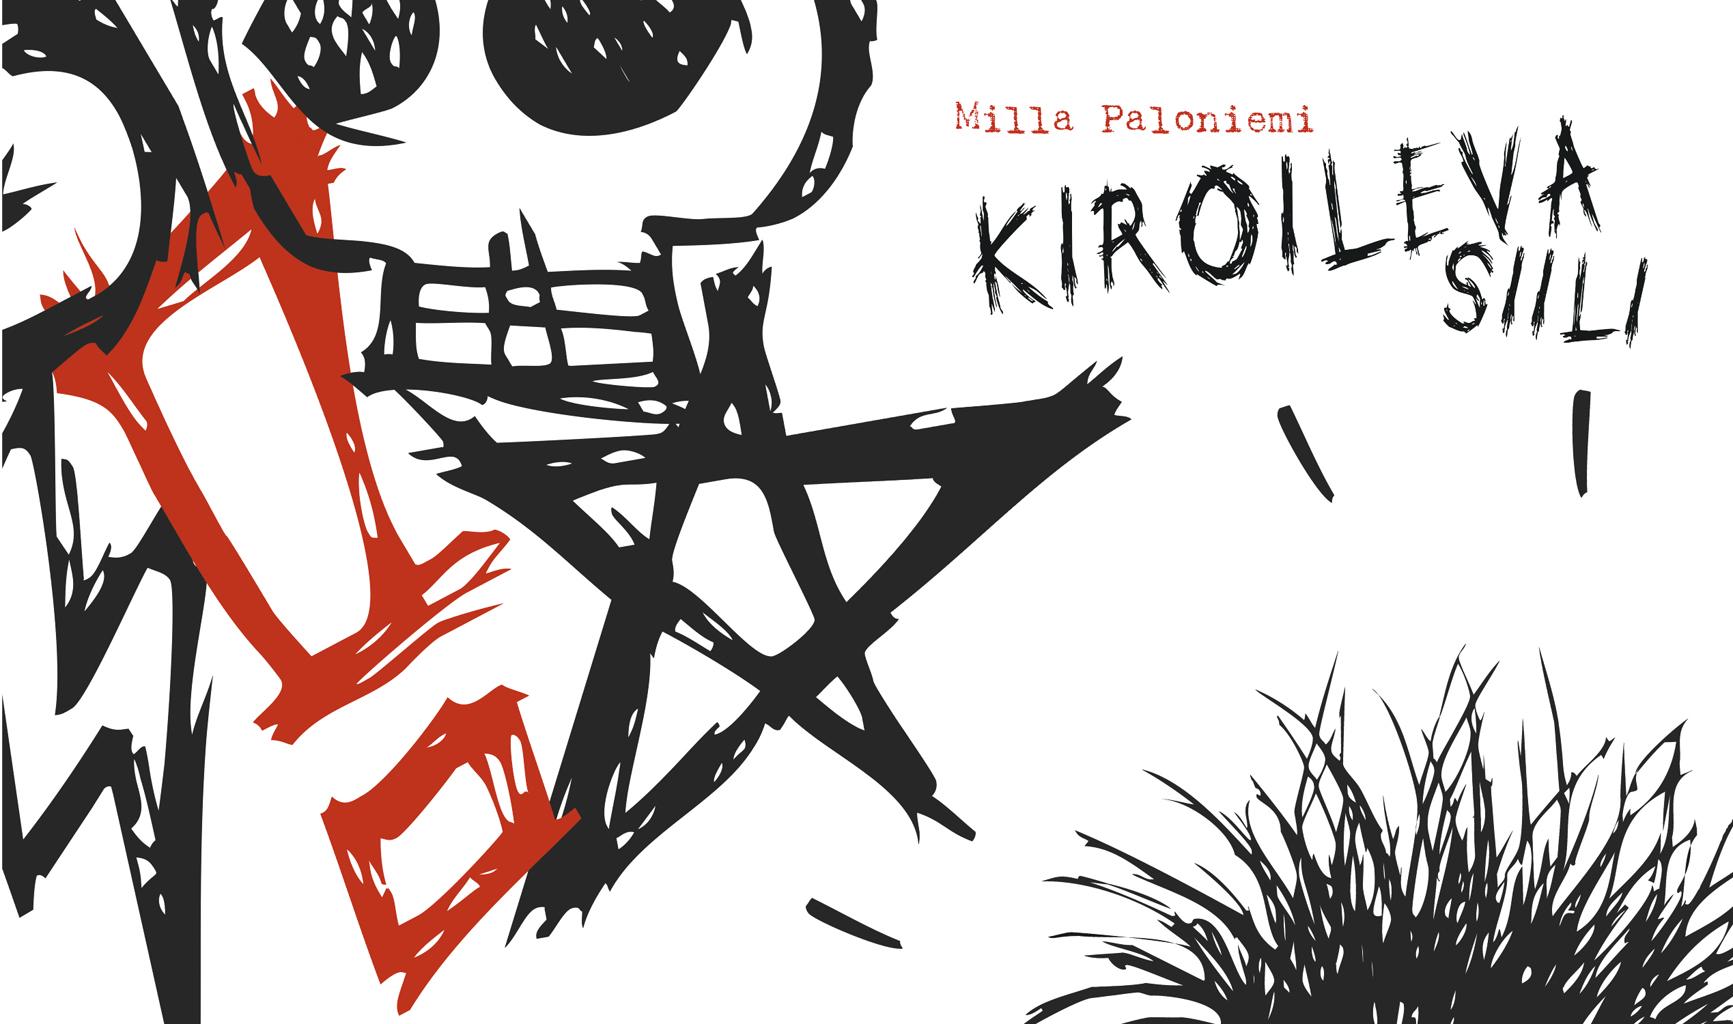 https://www.sammakko.com/wp-content/uploads/2016/06/kiroileva-siili.jpg